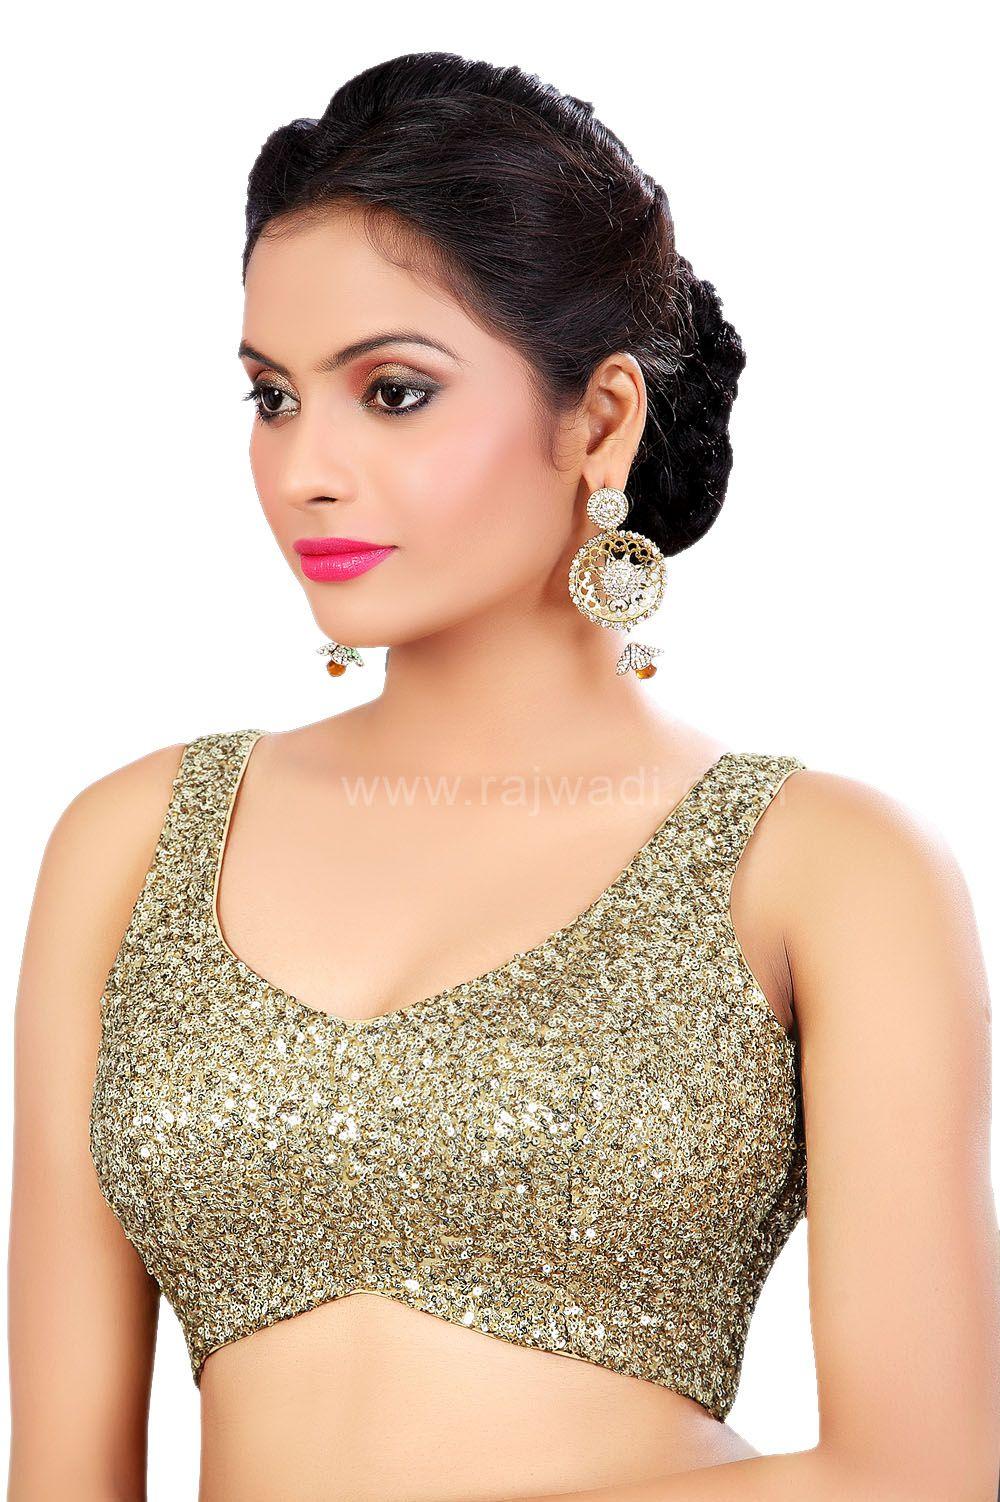 a4b58b9b8cb31d Golden Coloured Ready Made Choli Saree Blouse Patterns, Sari Blouse, Saree  Blouse Designs,